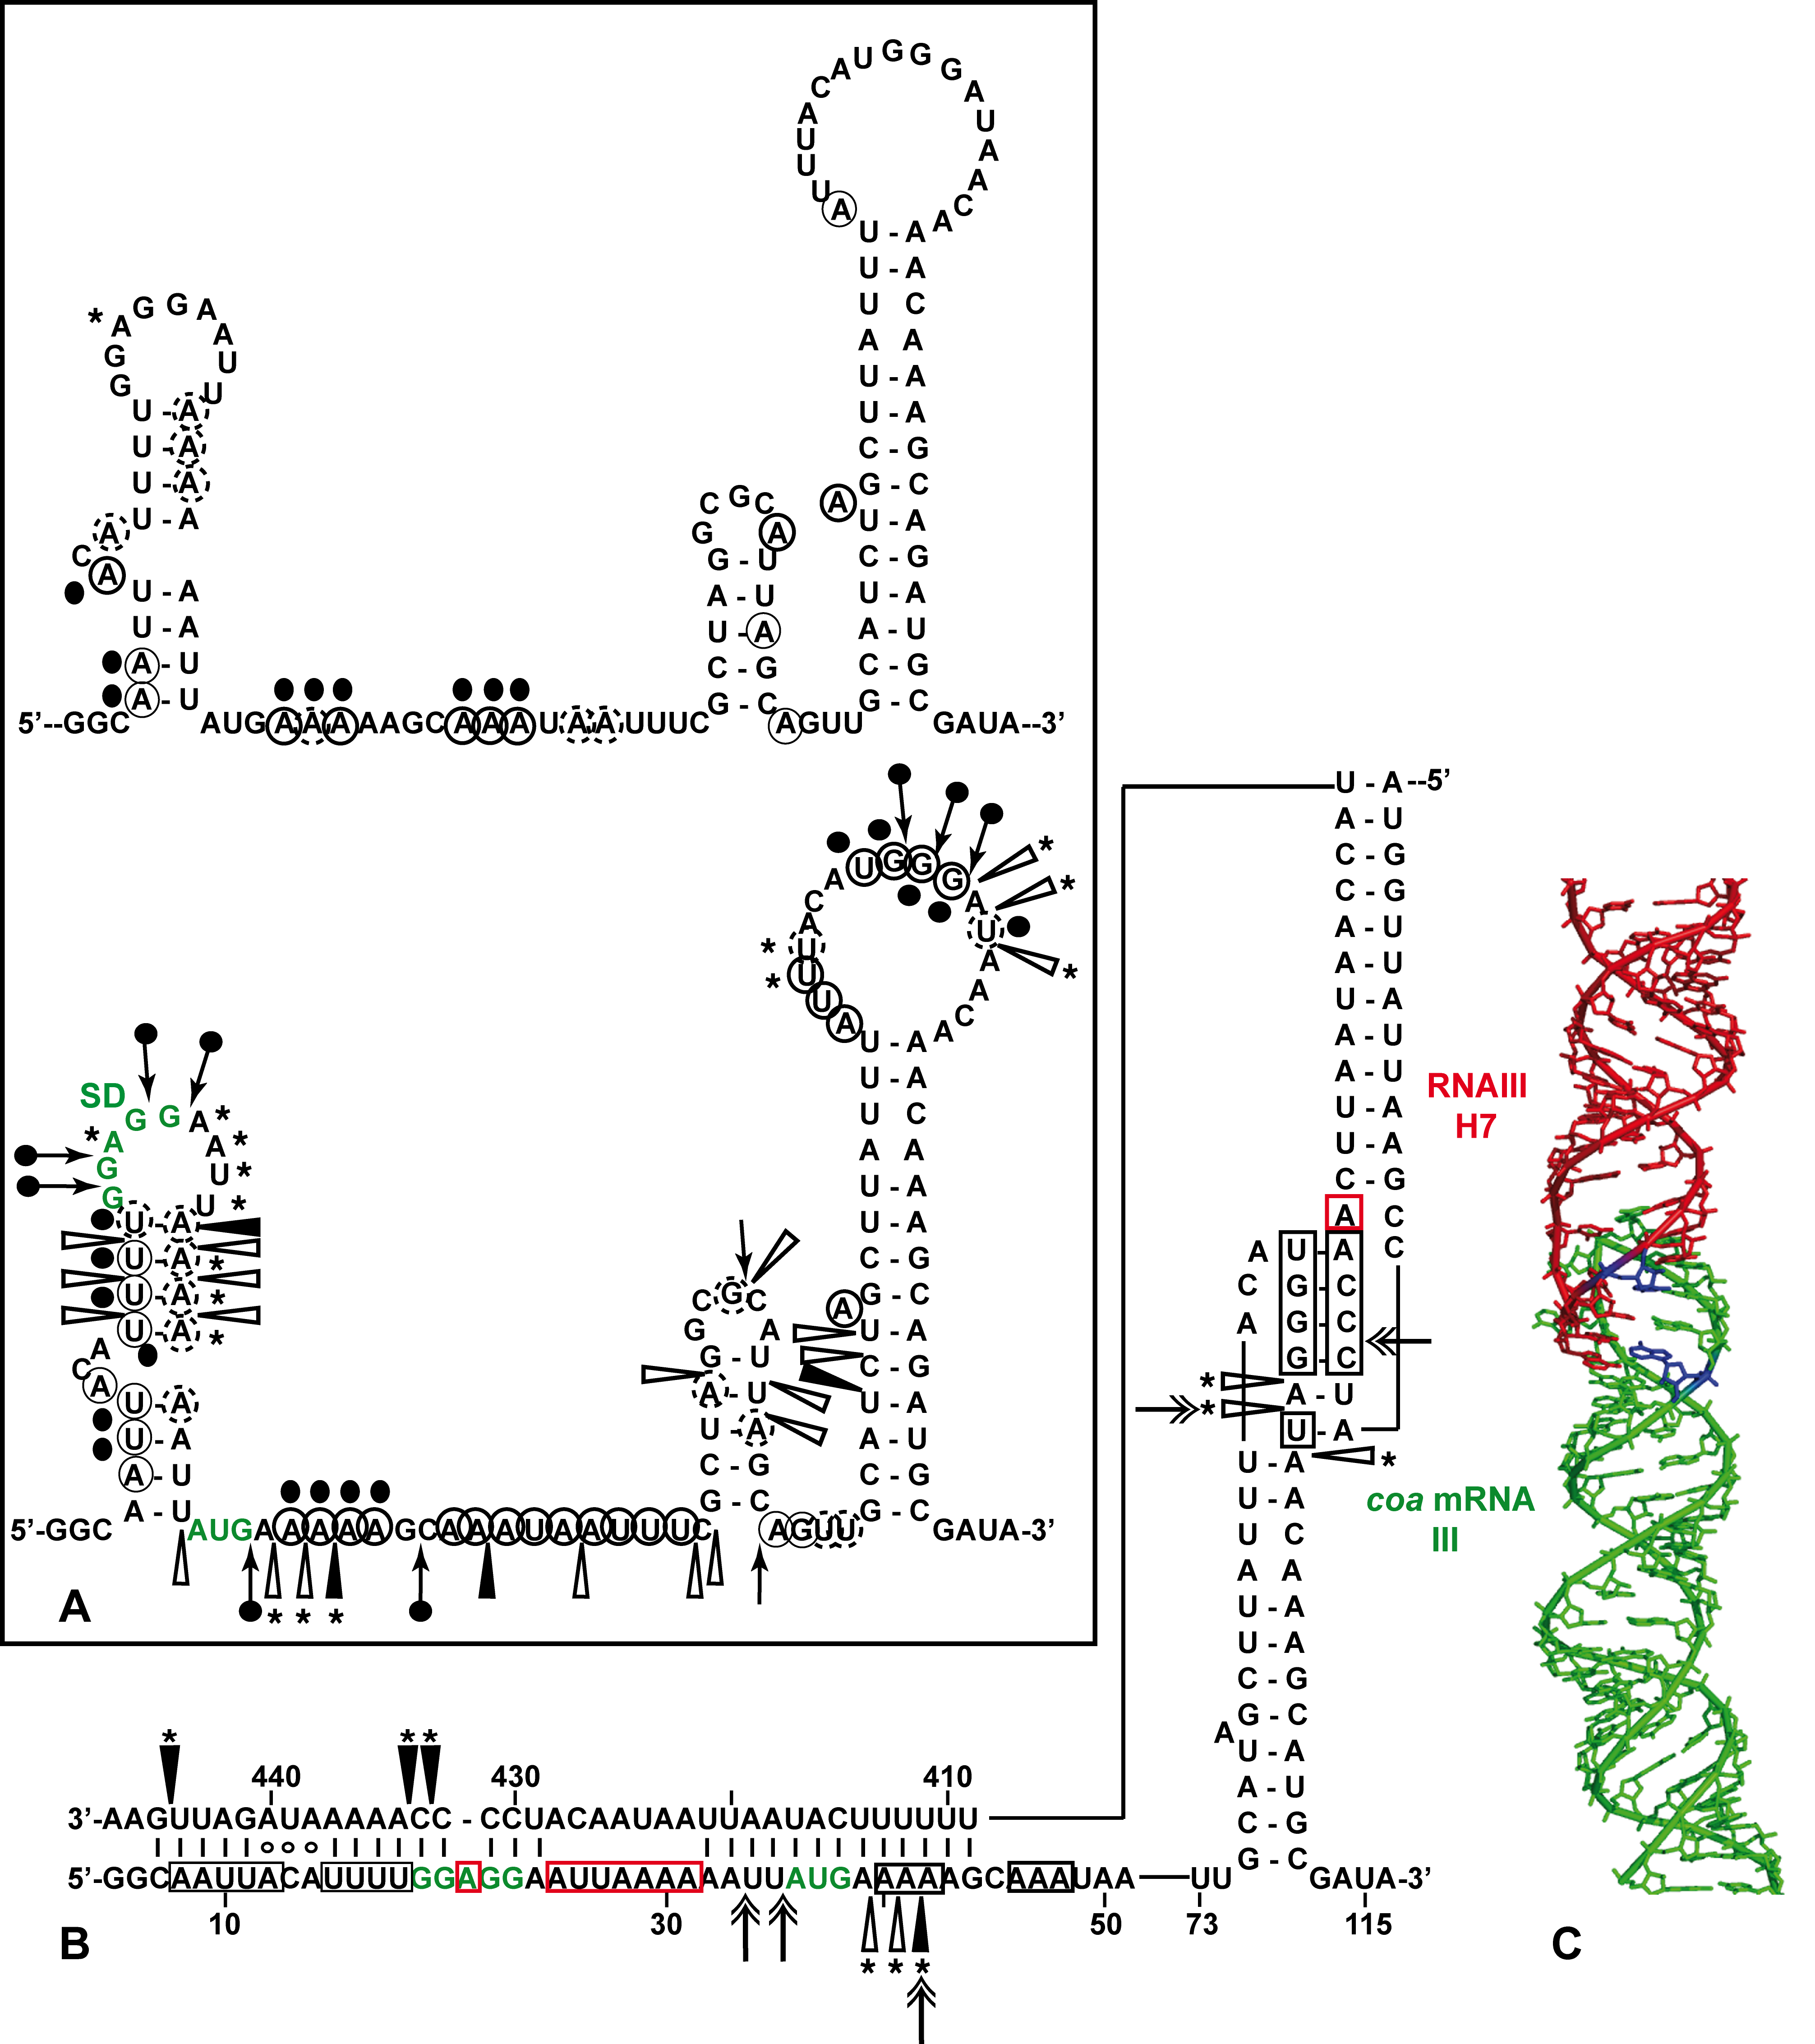 Structure of the RNAIII-<i>coa</i> mRNA complex.